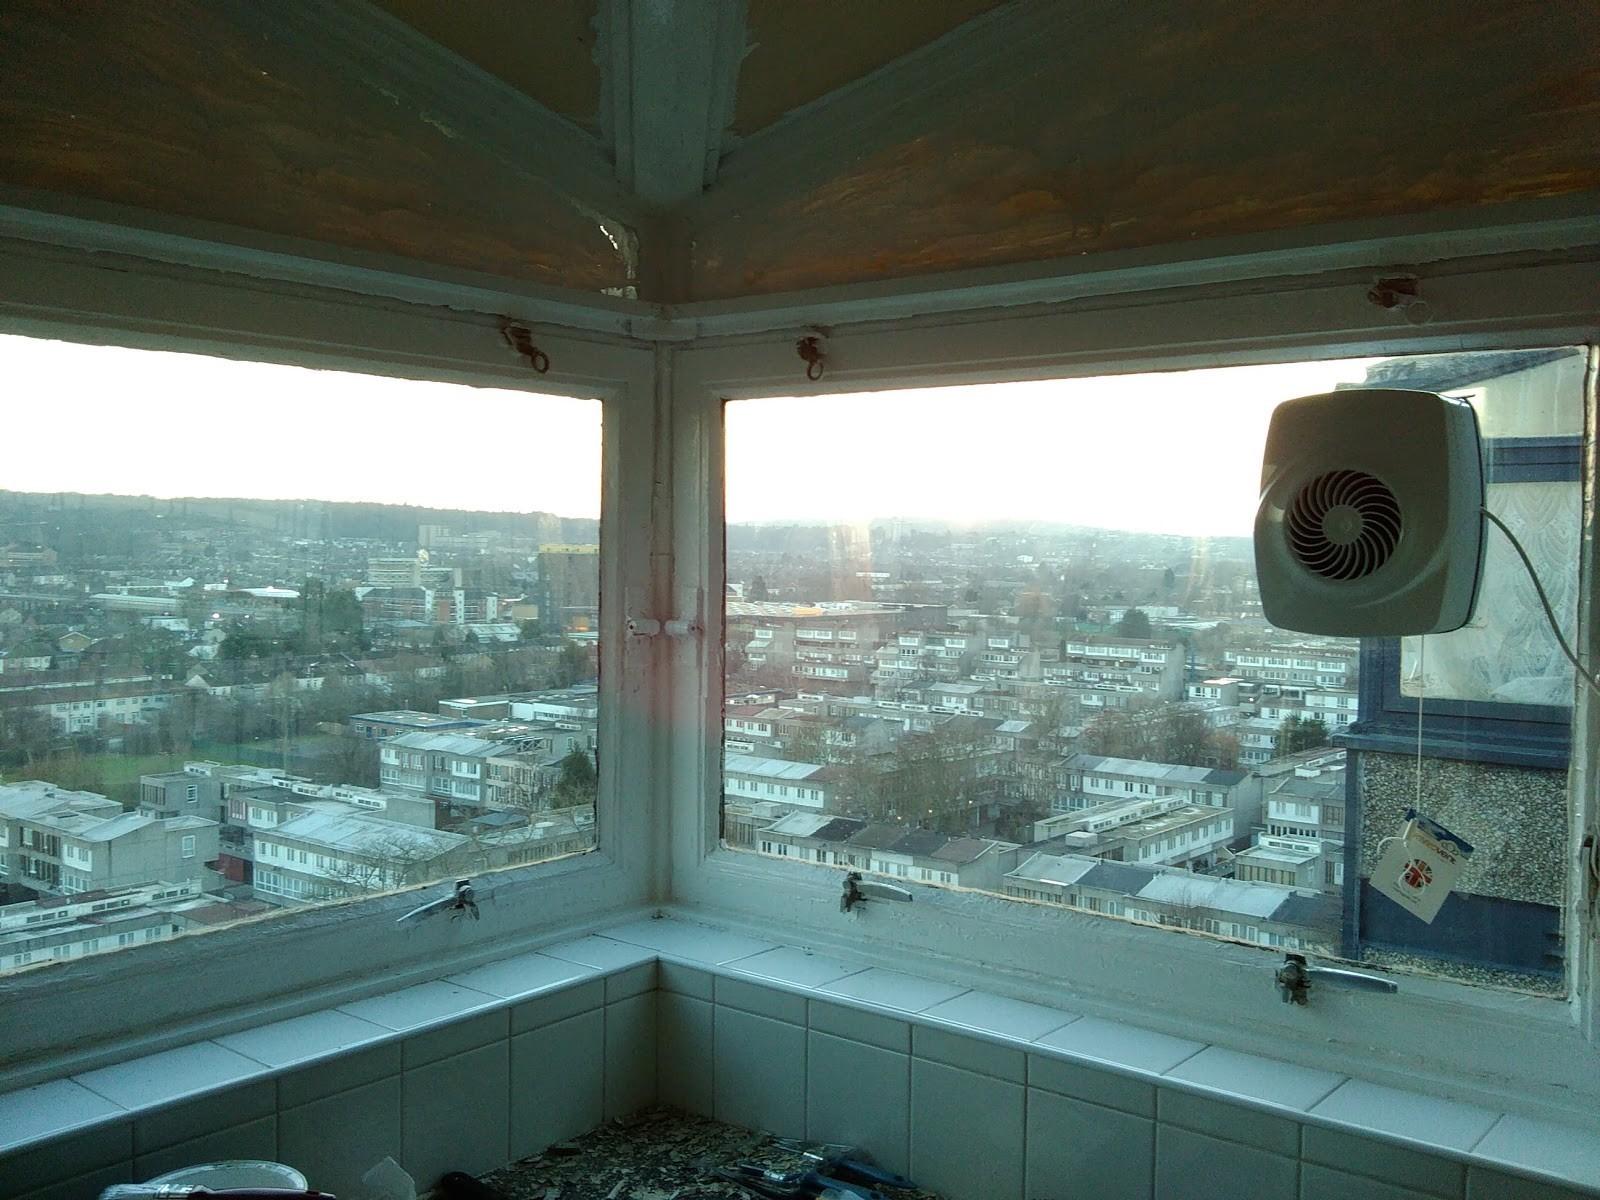 Nigel\'s DIY Adventures in Thamesmead Part 1 - A Kitchen - Dot Dot Dot